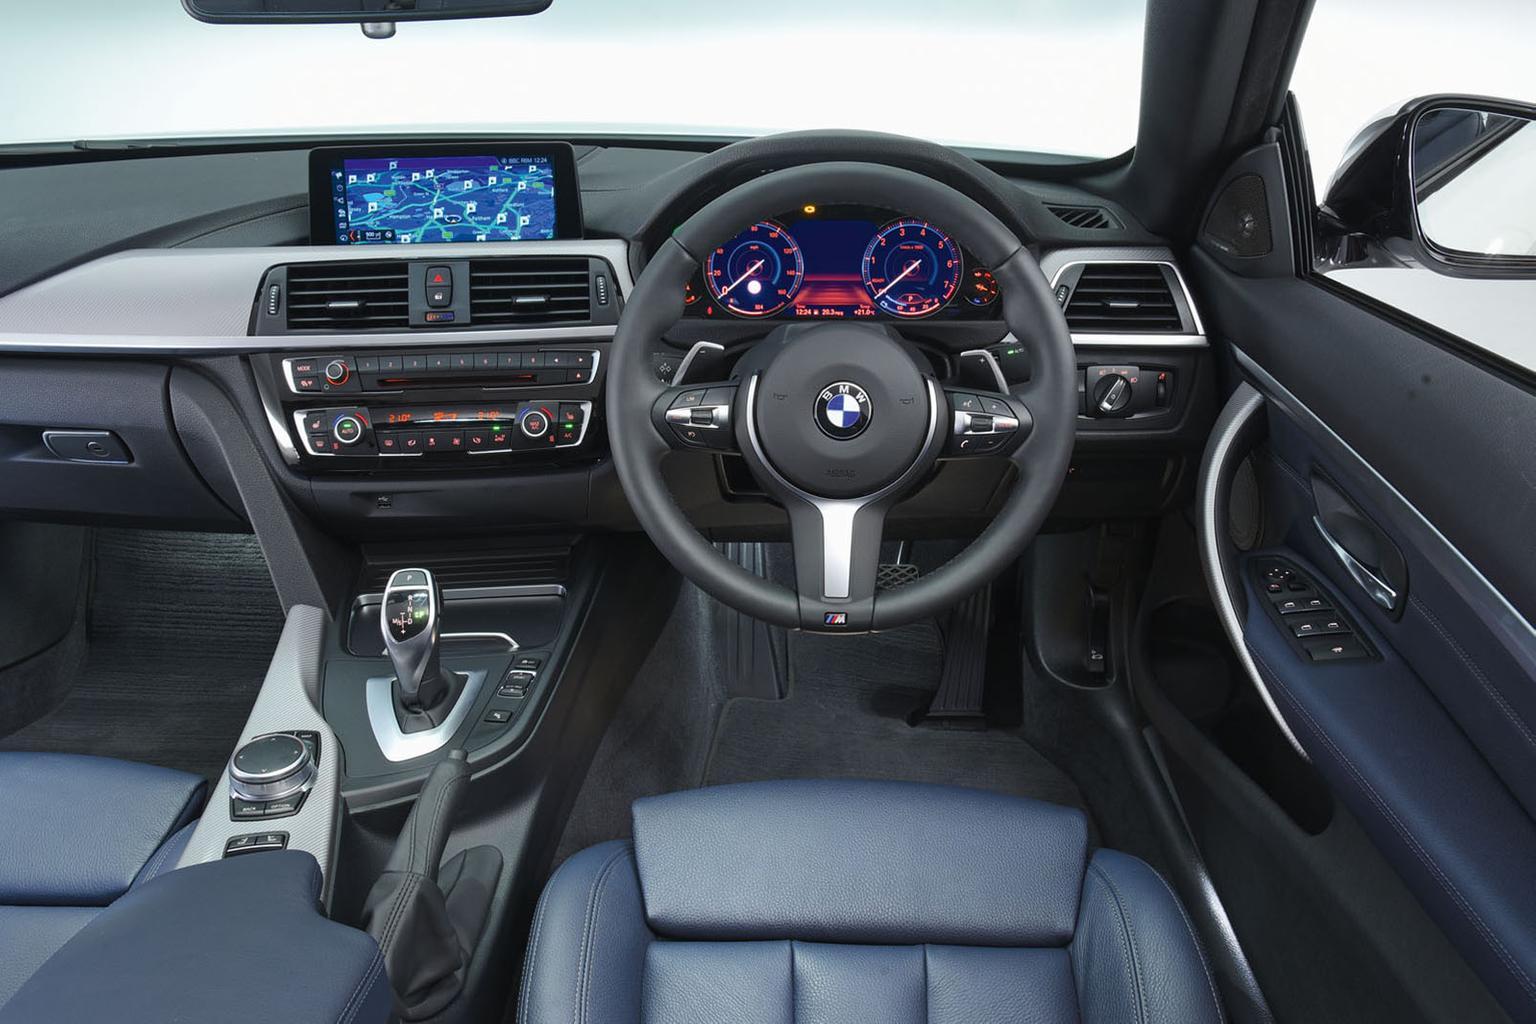 Audi A5 Cabriolet vs BMW 4 Series Convertible